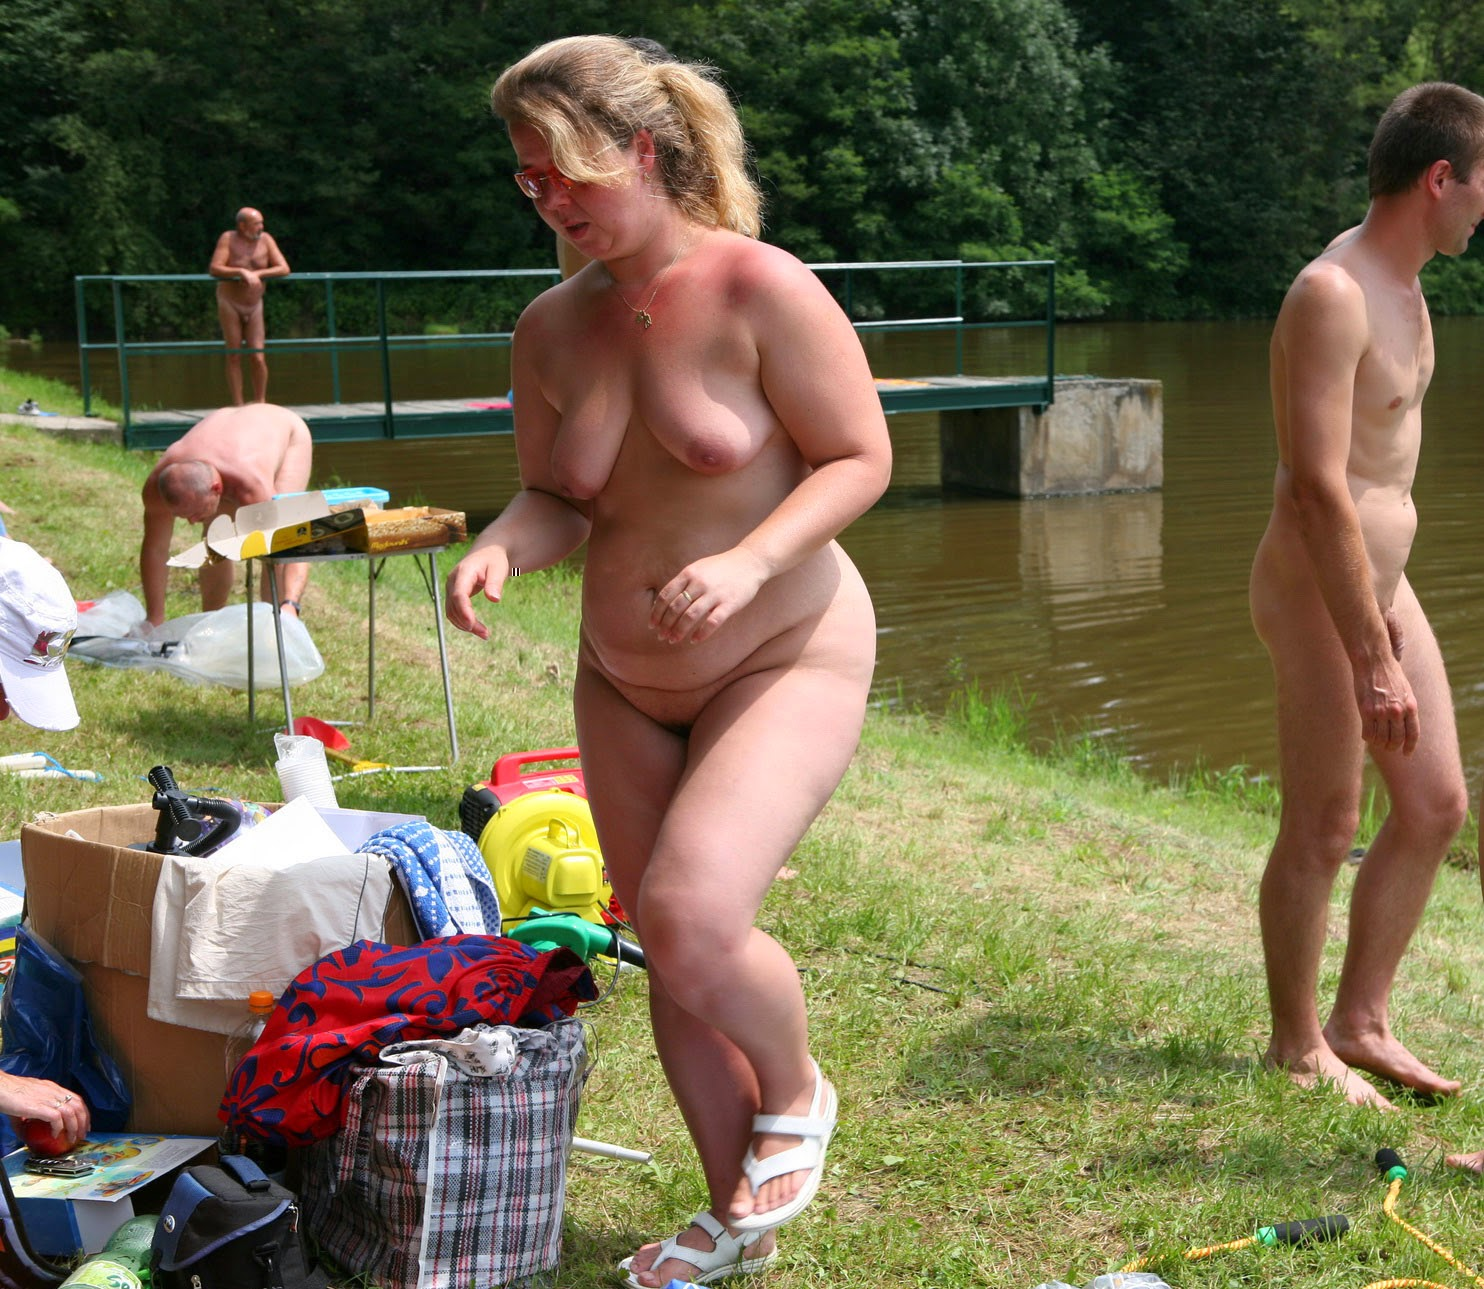 young nudists  Family nudism and naturism blog  Purenudism